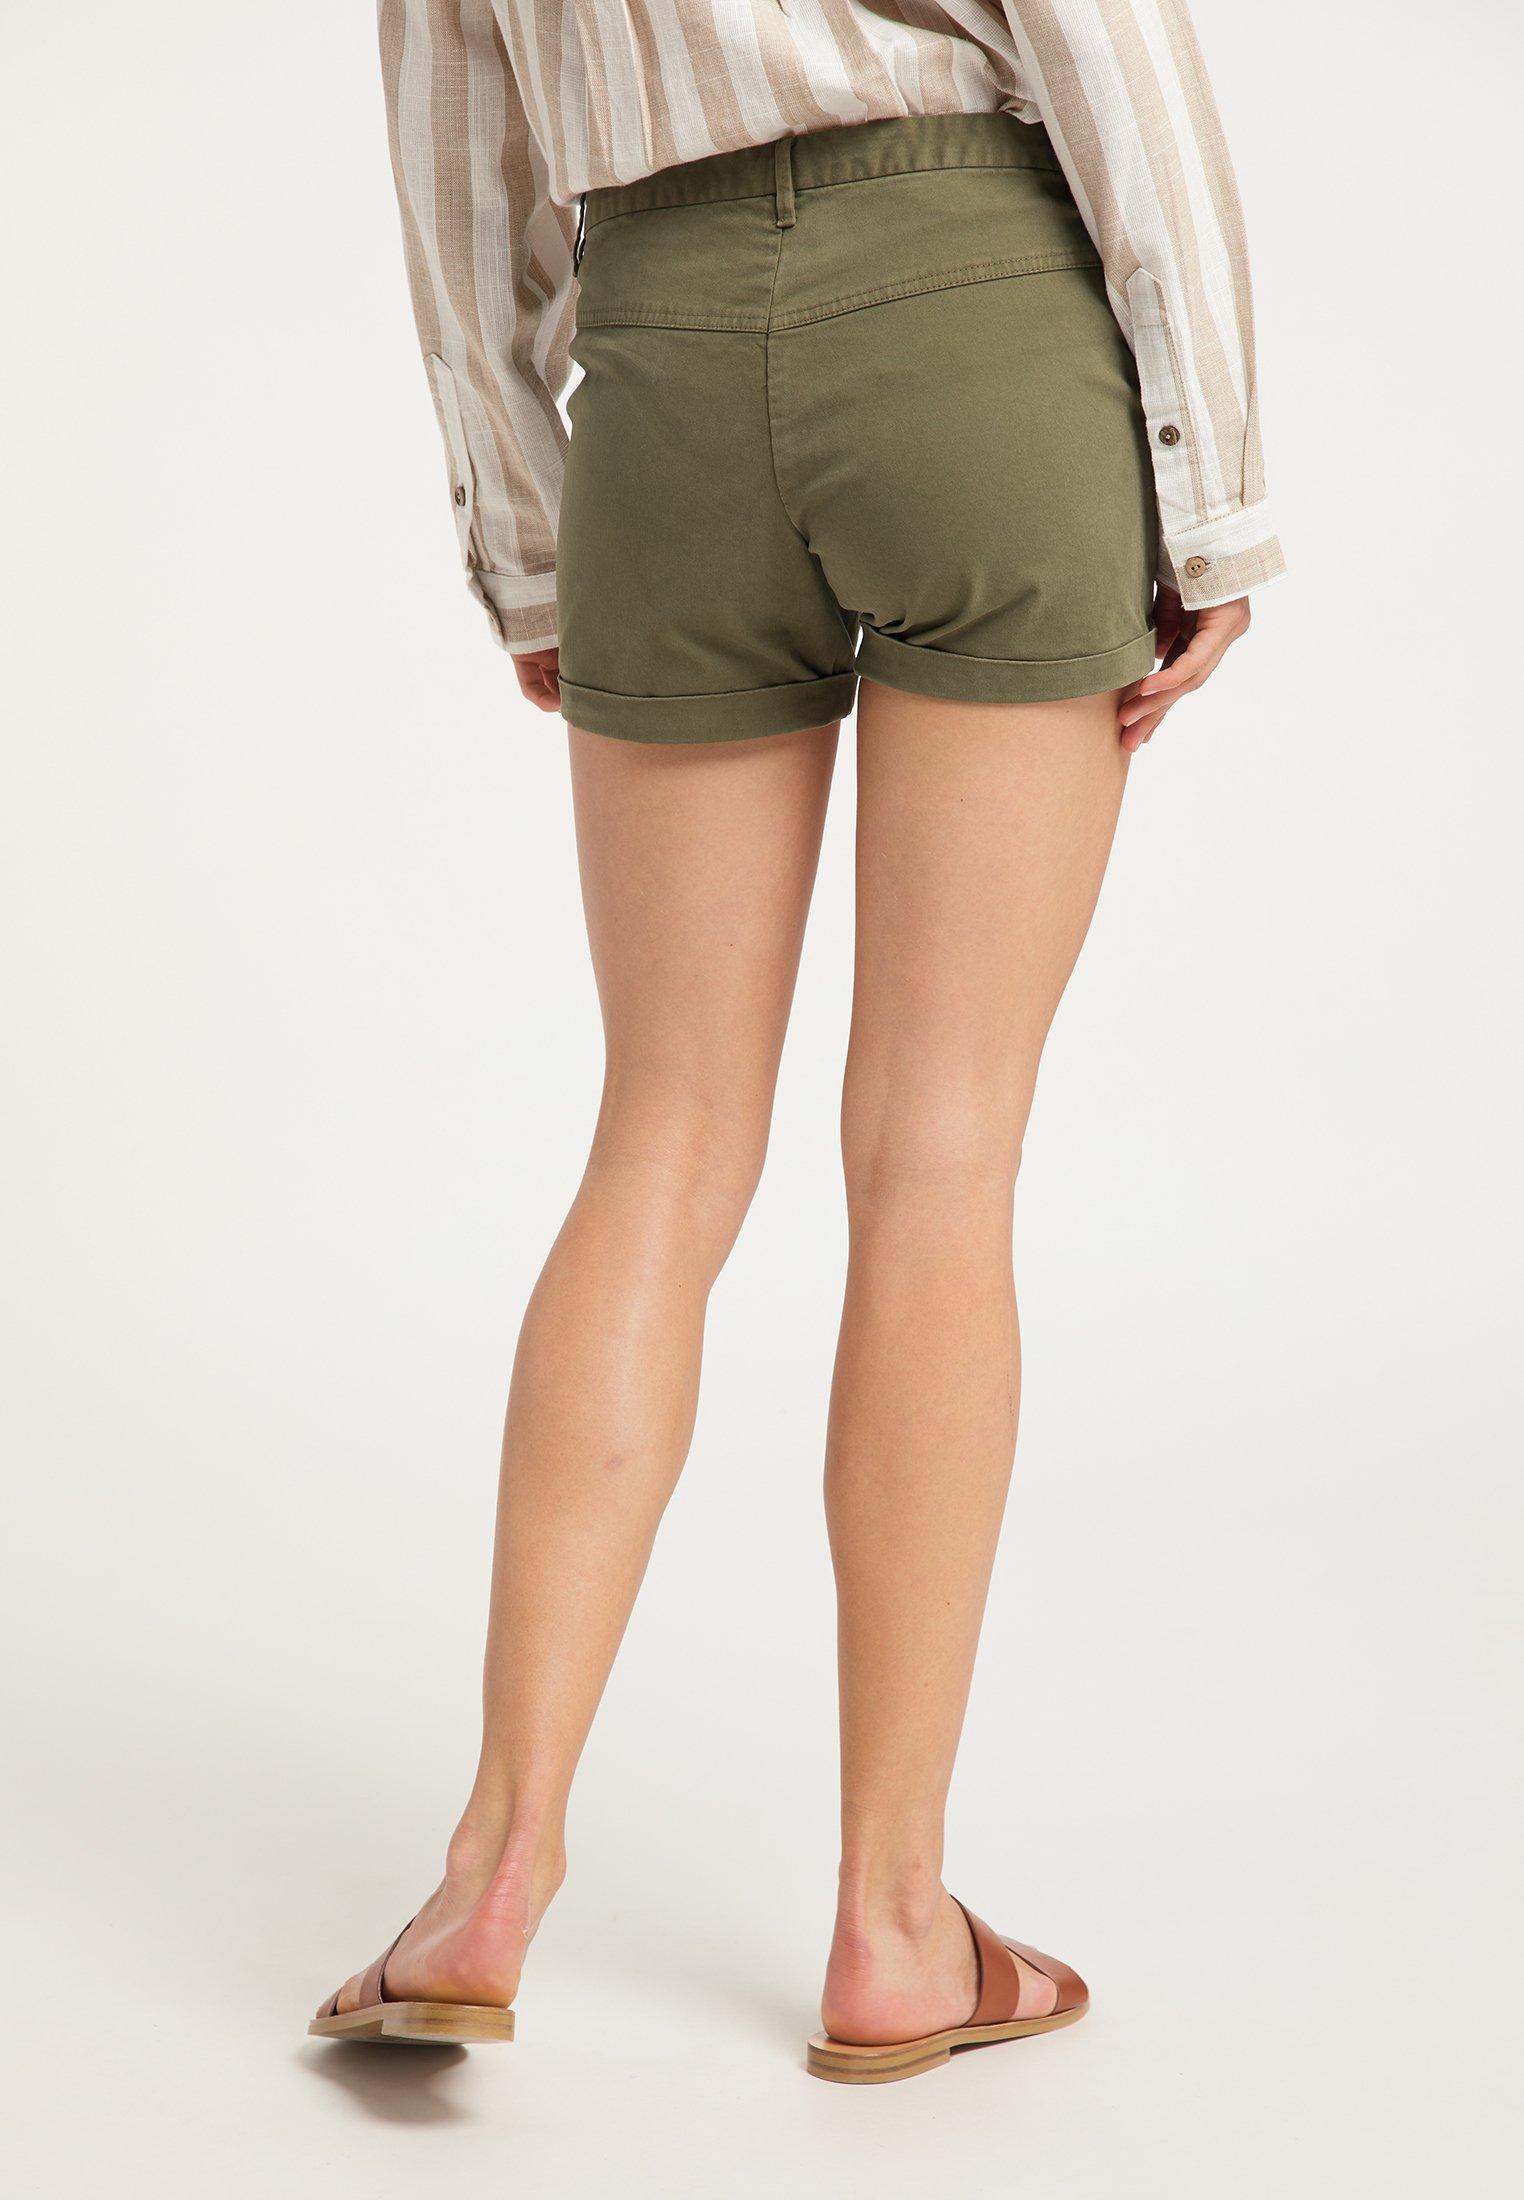 Recommend Cheap Women's Clothing DreiMaster Shorts helloliv 3gaprABoA